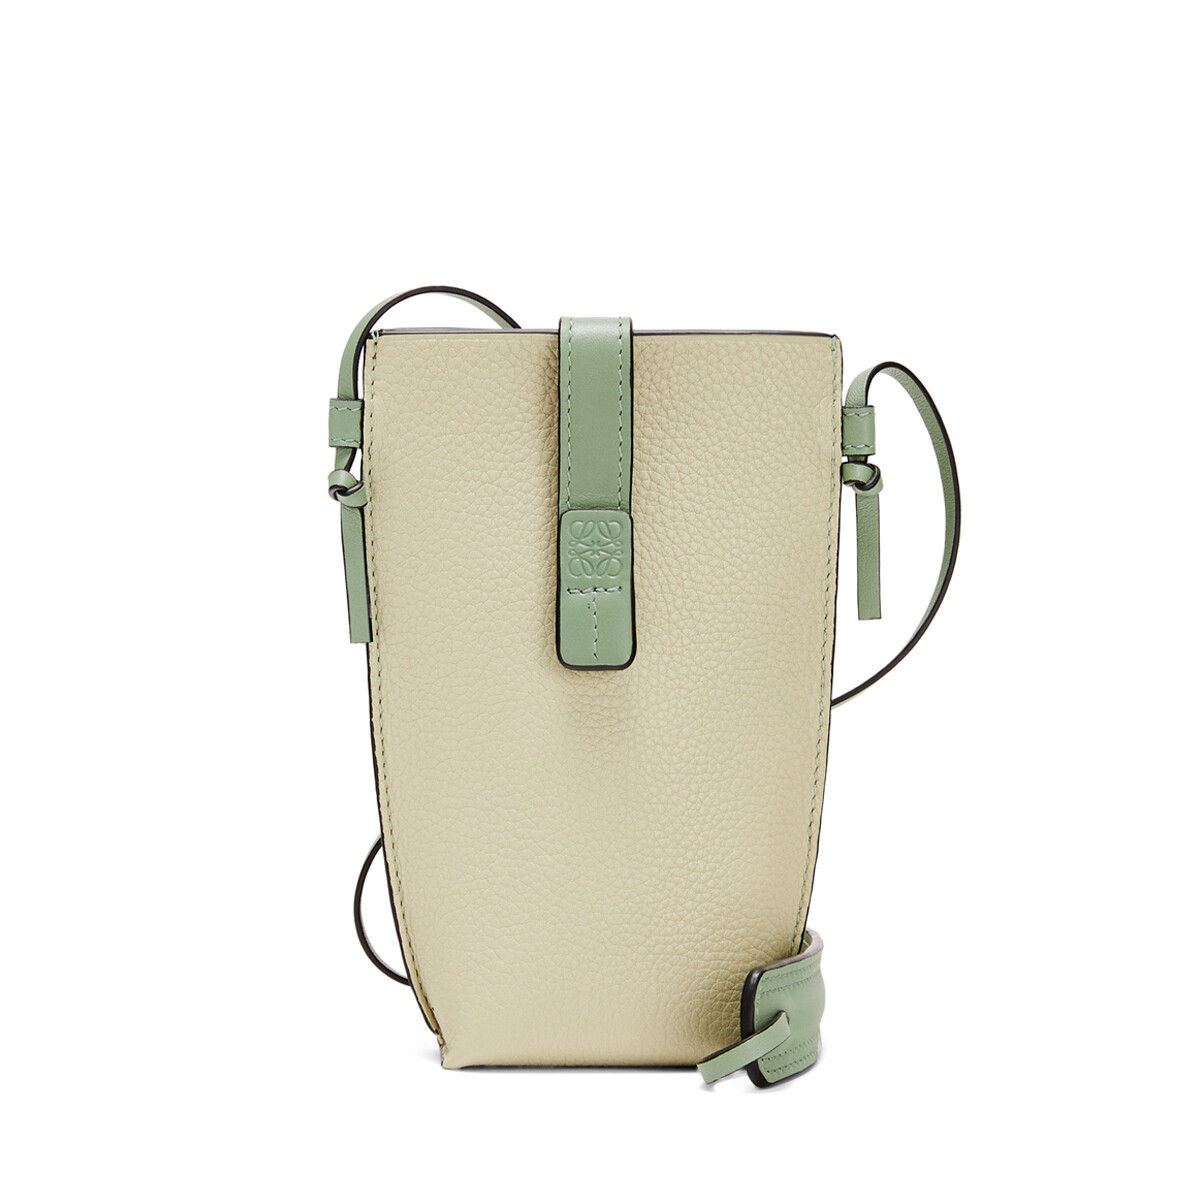 LOEWE Pocket Sage/Pale Green front